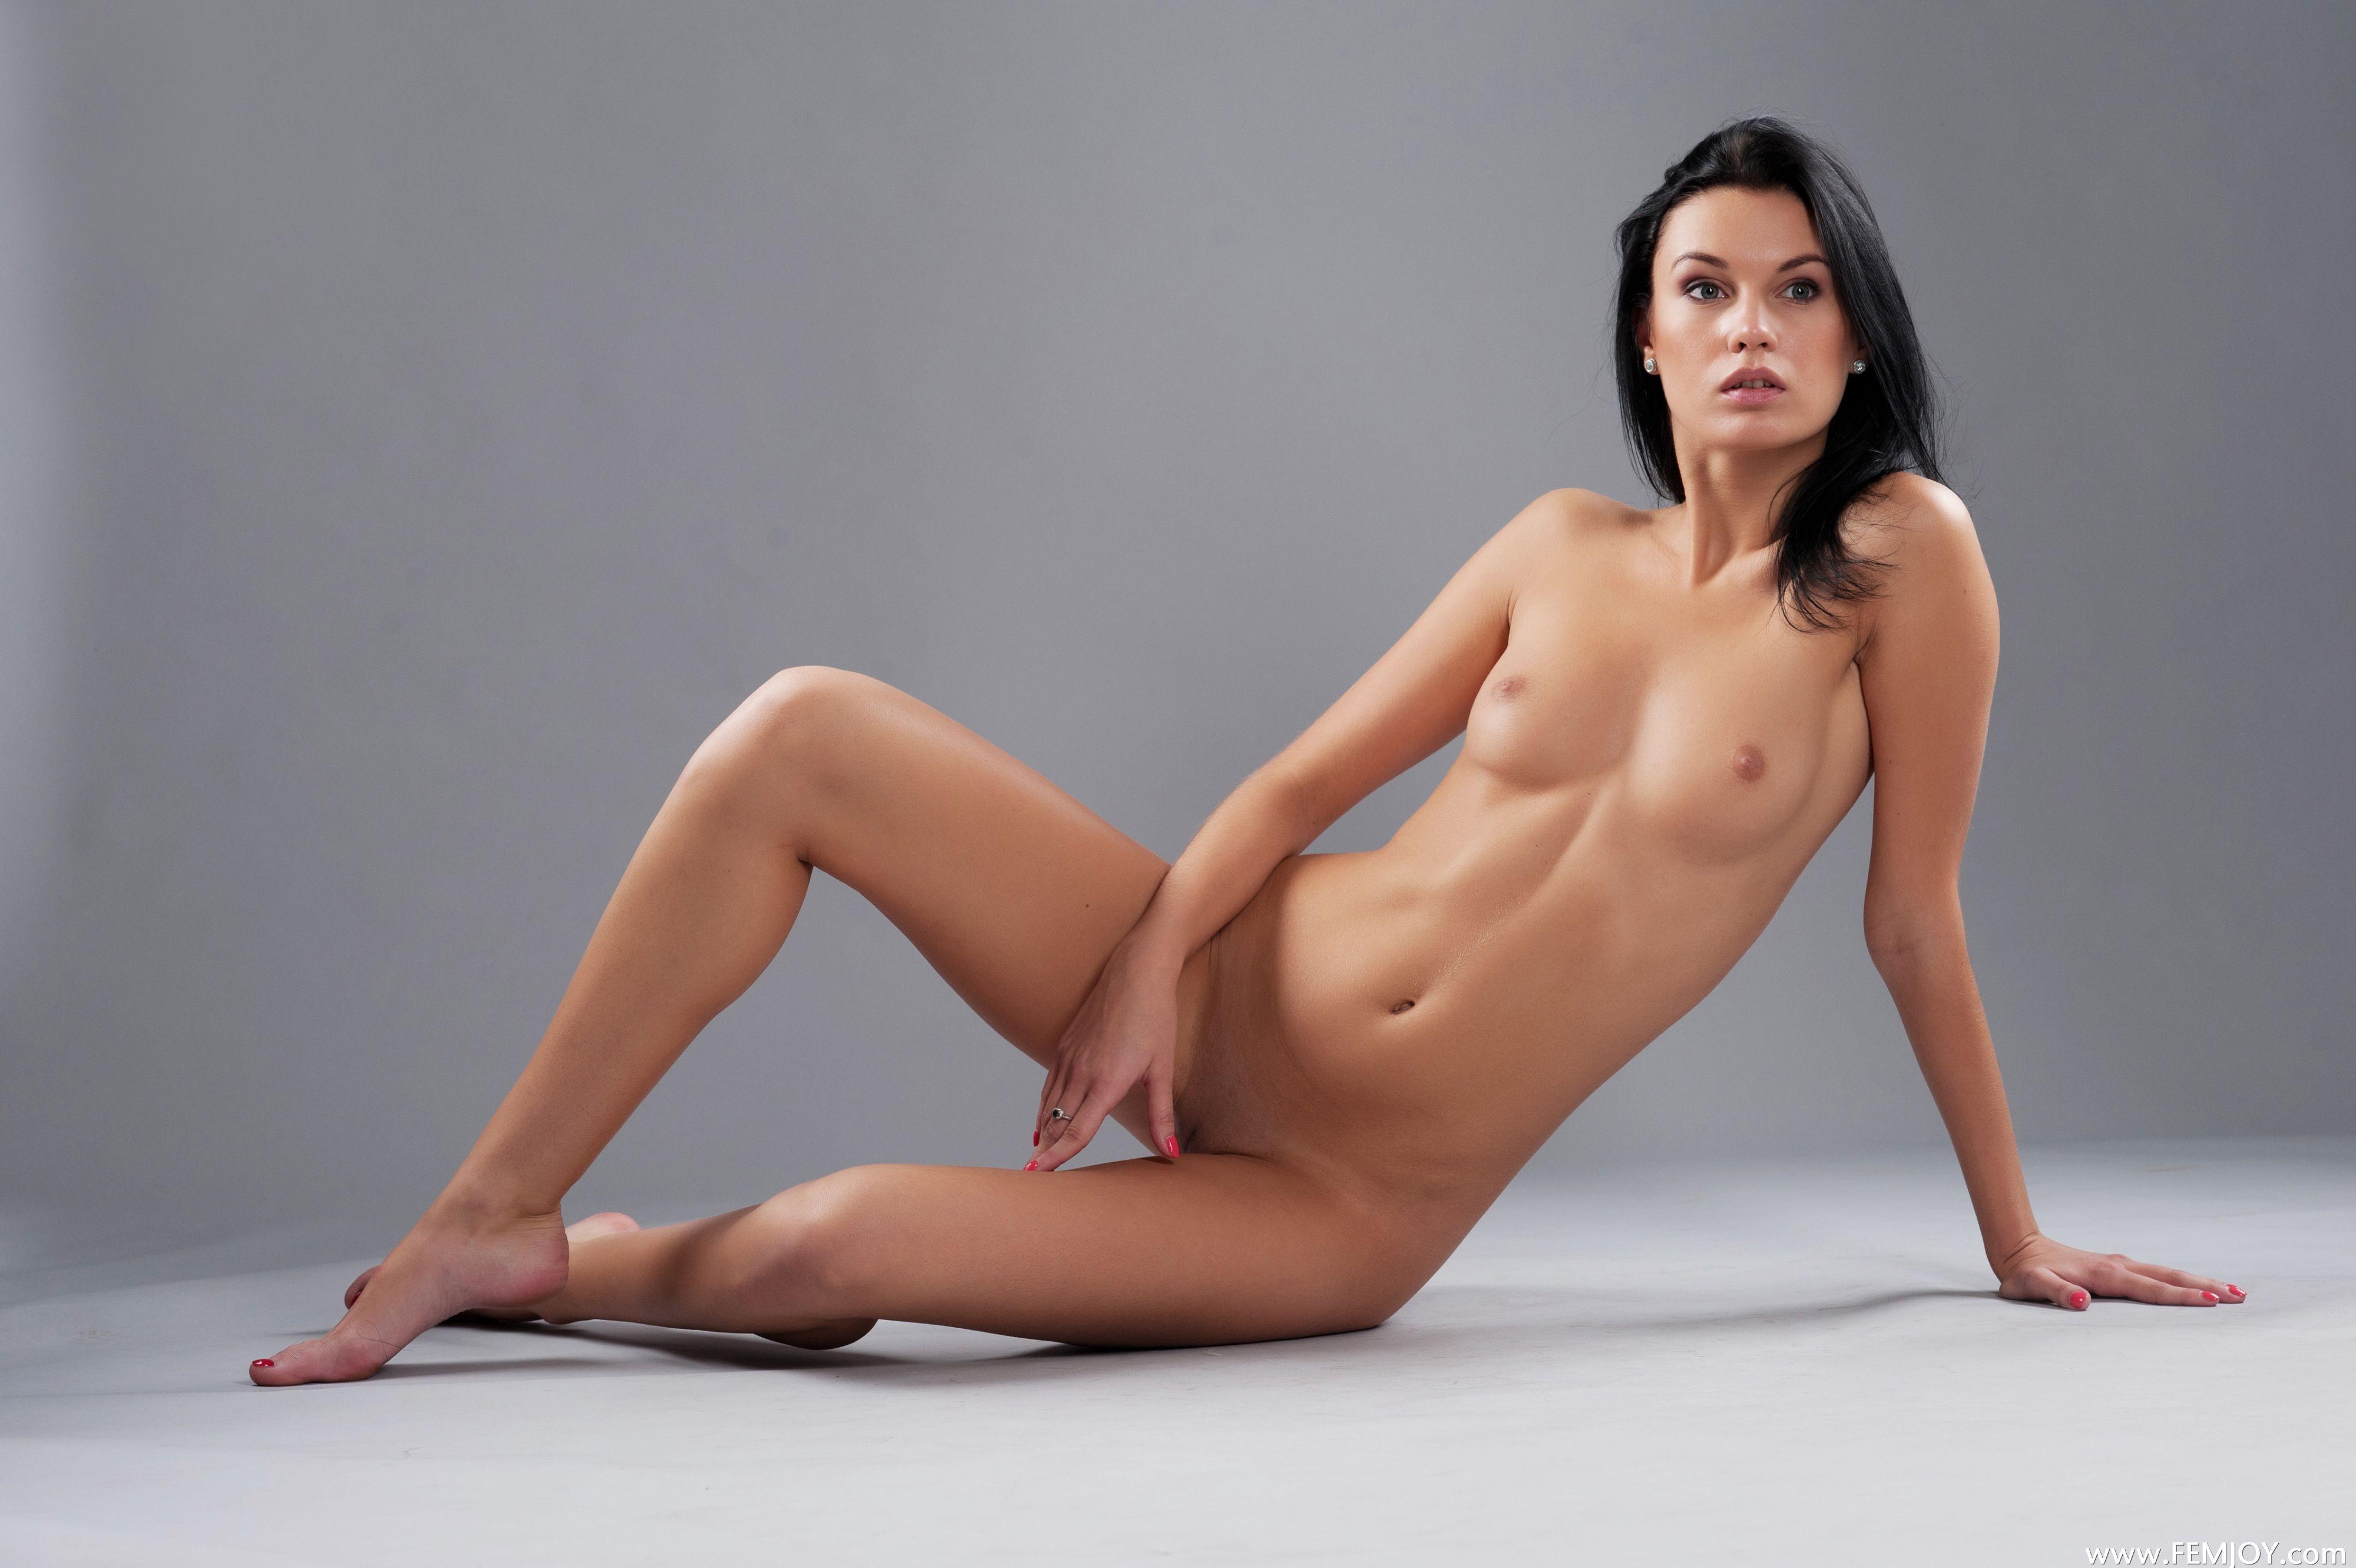 http://i2.imageban.ru/out/2013/08/14/4114ae9d1b8d530671bc8f30f5dcc135.jpg